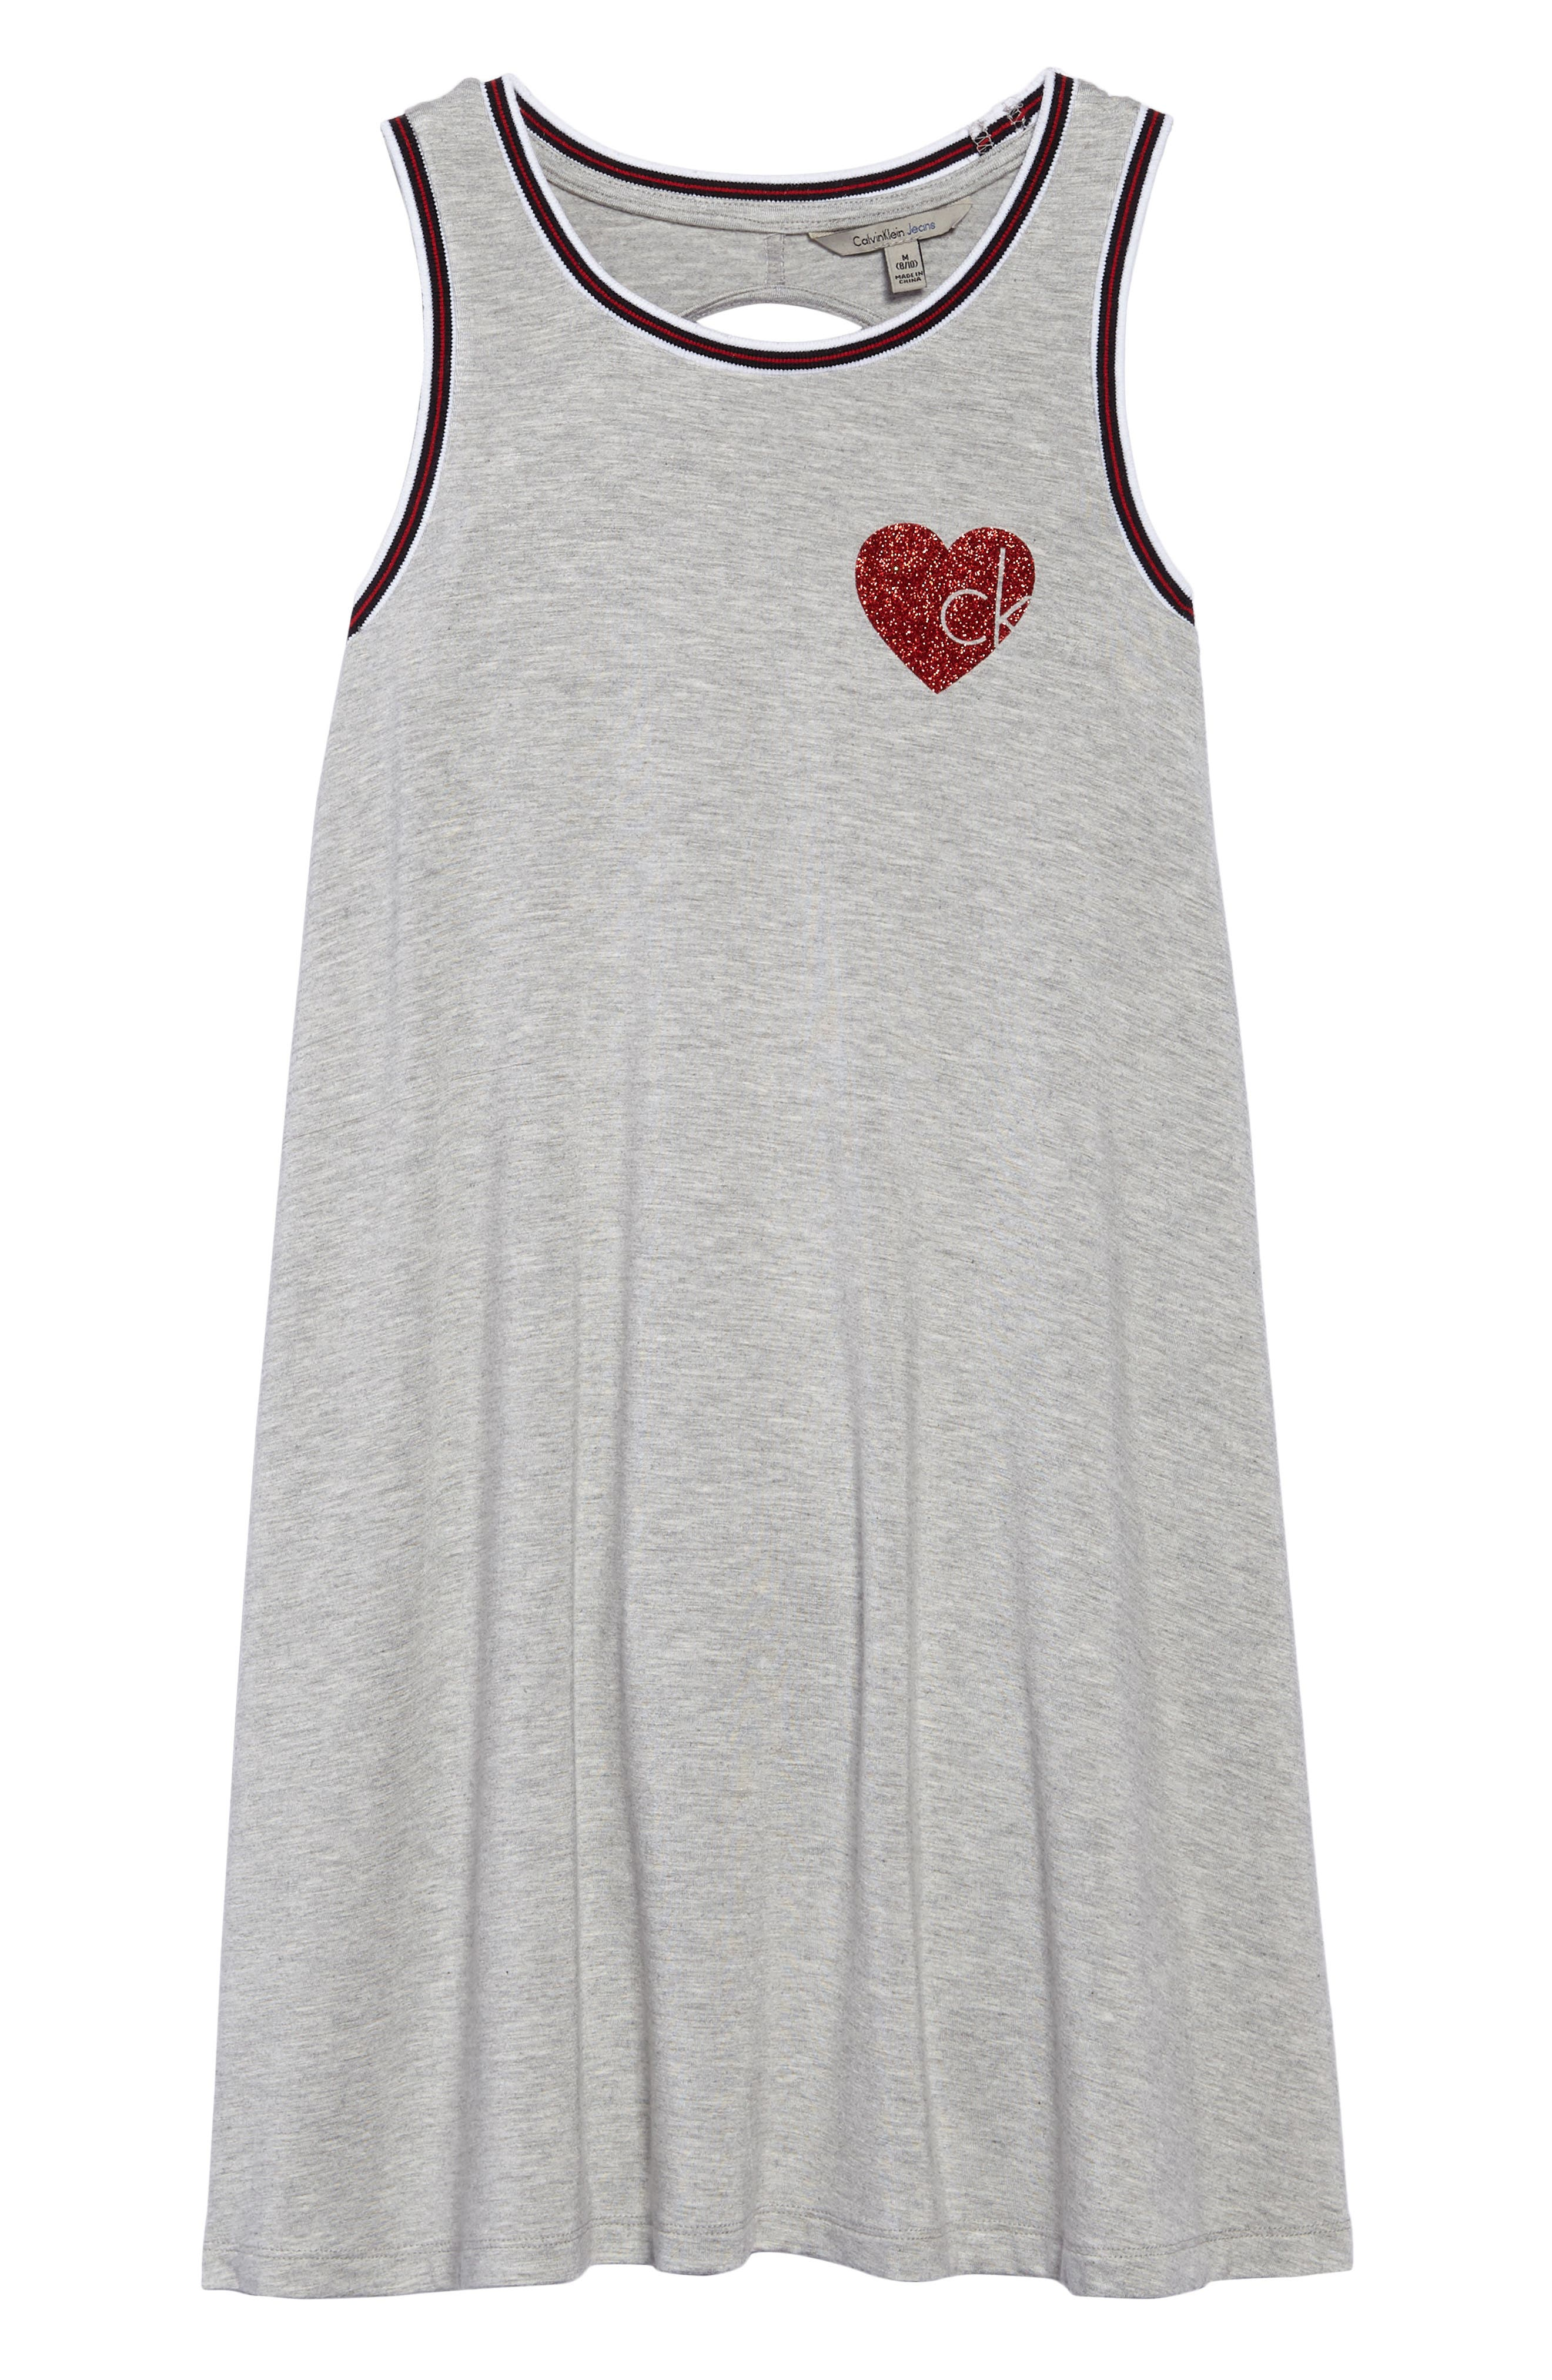 Athleisure Sleeveless Dress,                             Main thumbnail 1, color,                             020